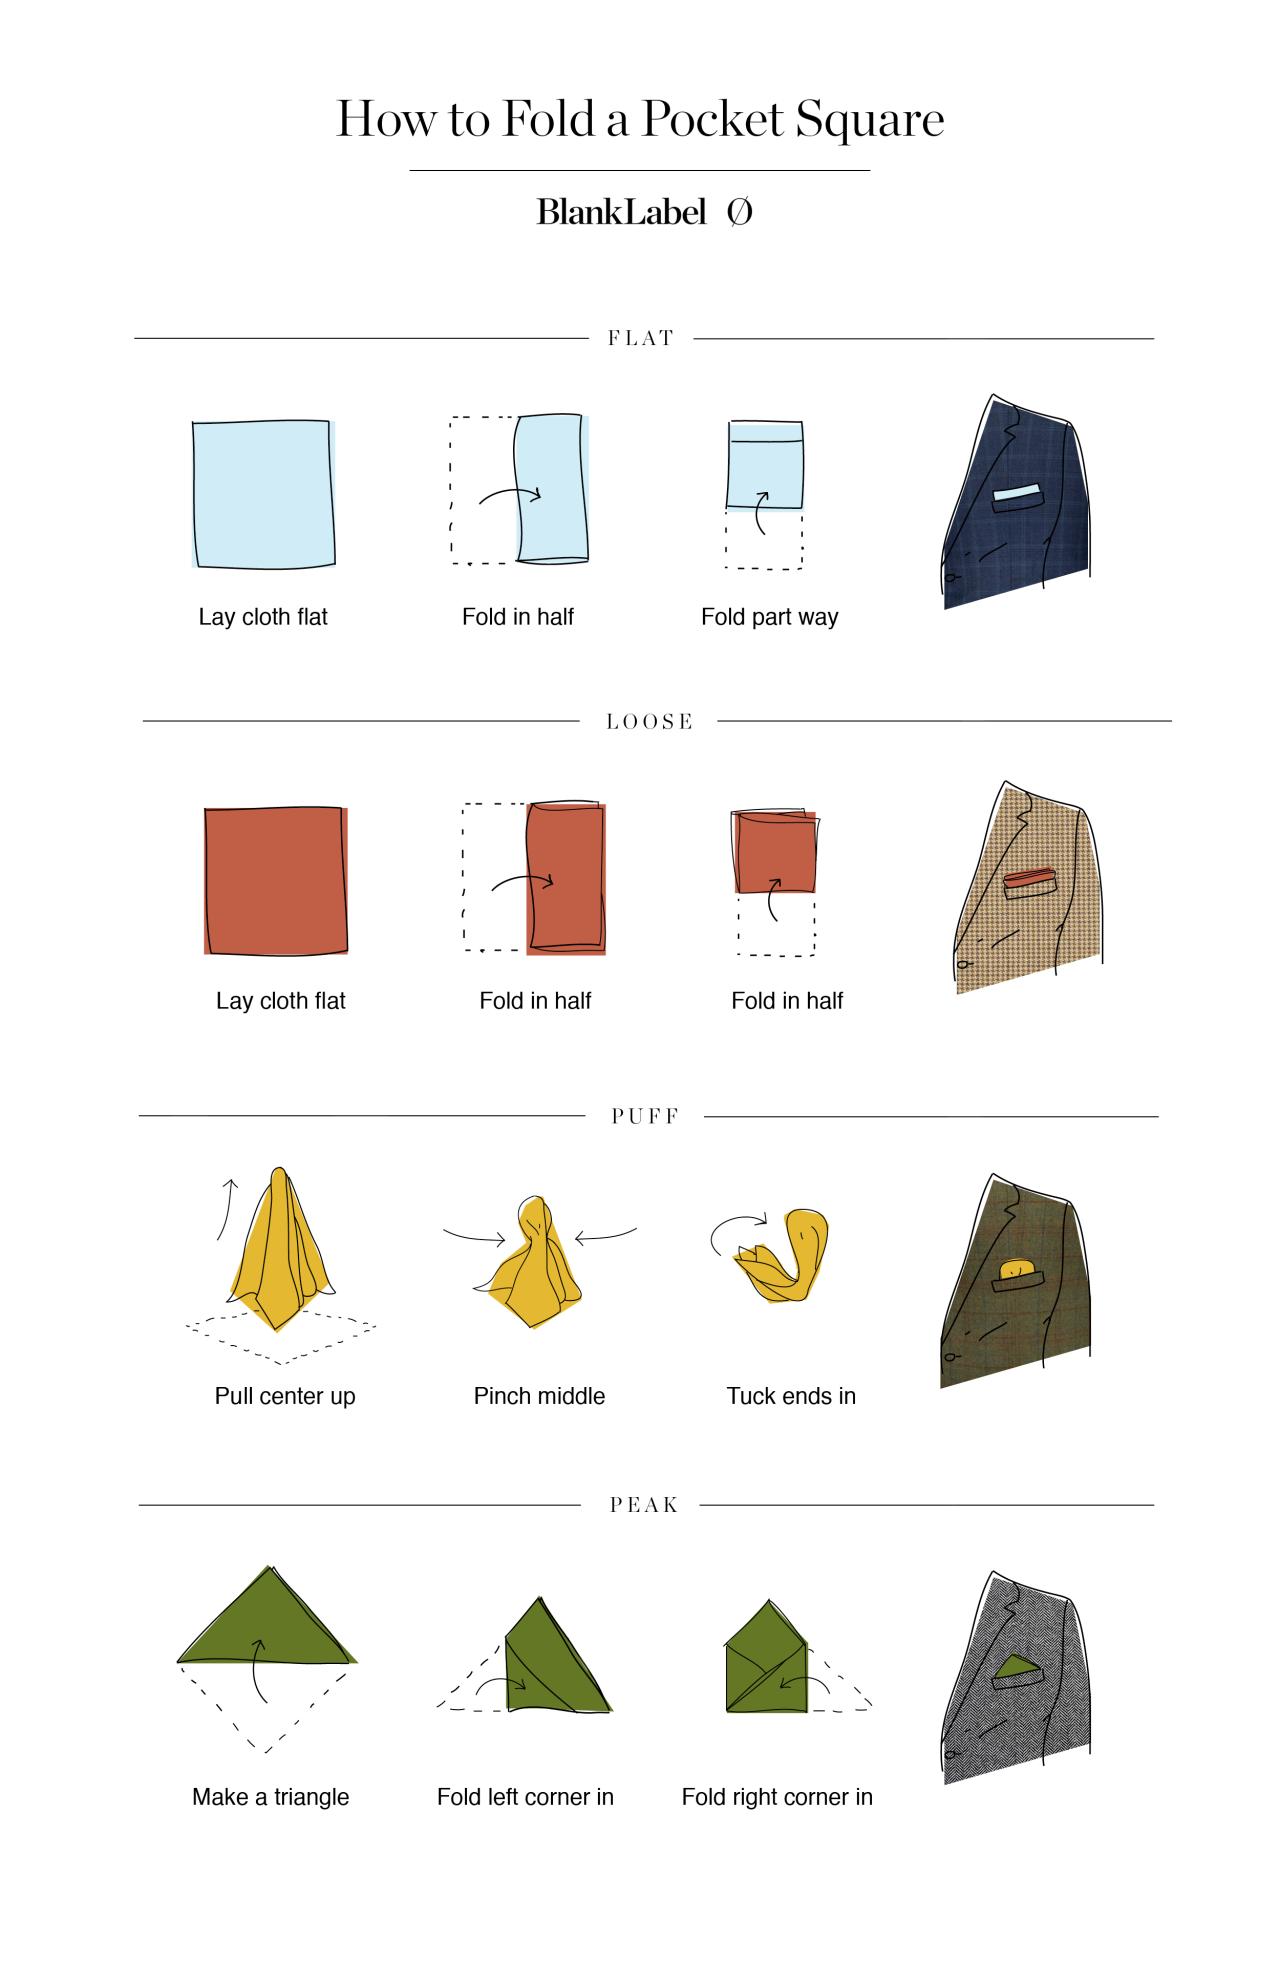 Pocket Square Infographic Wardrobe Pocket Square Pocket Square